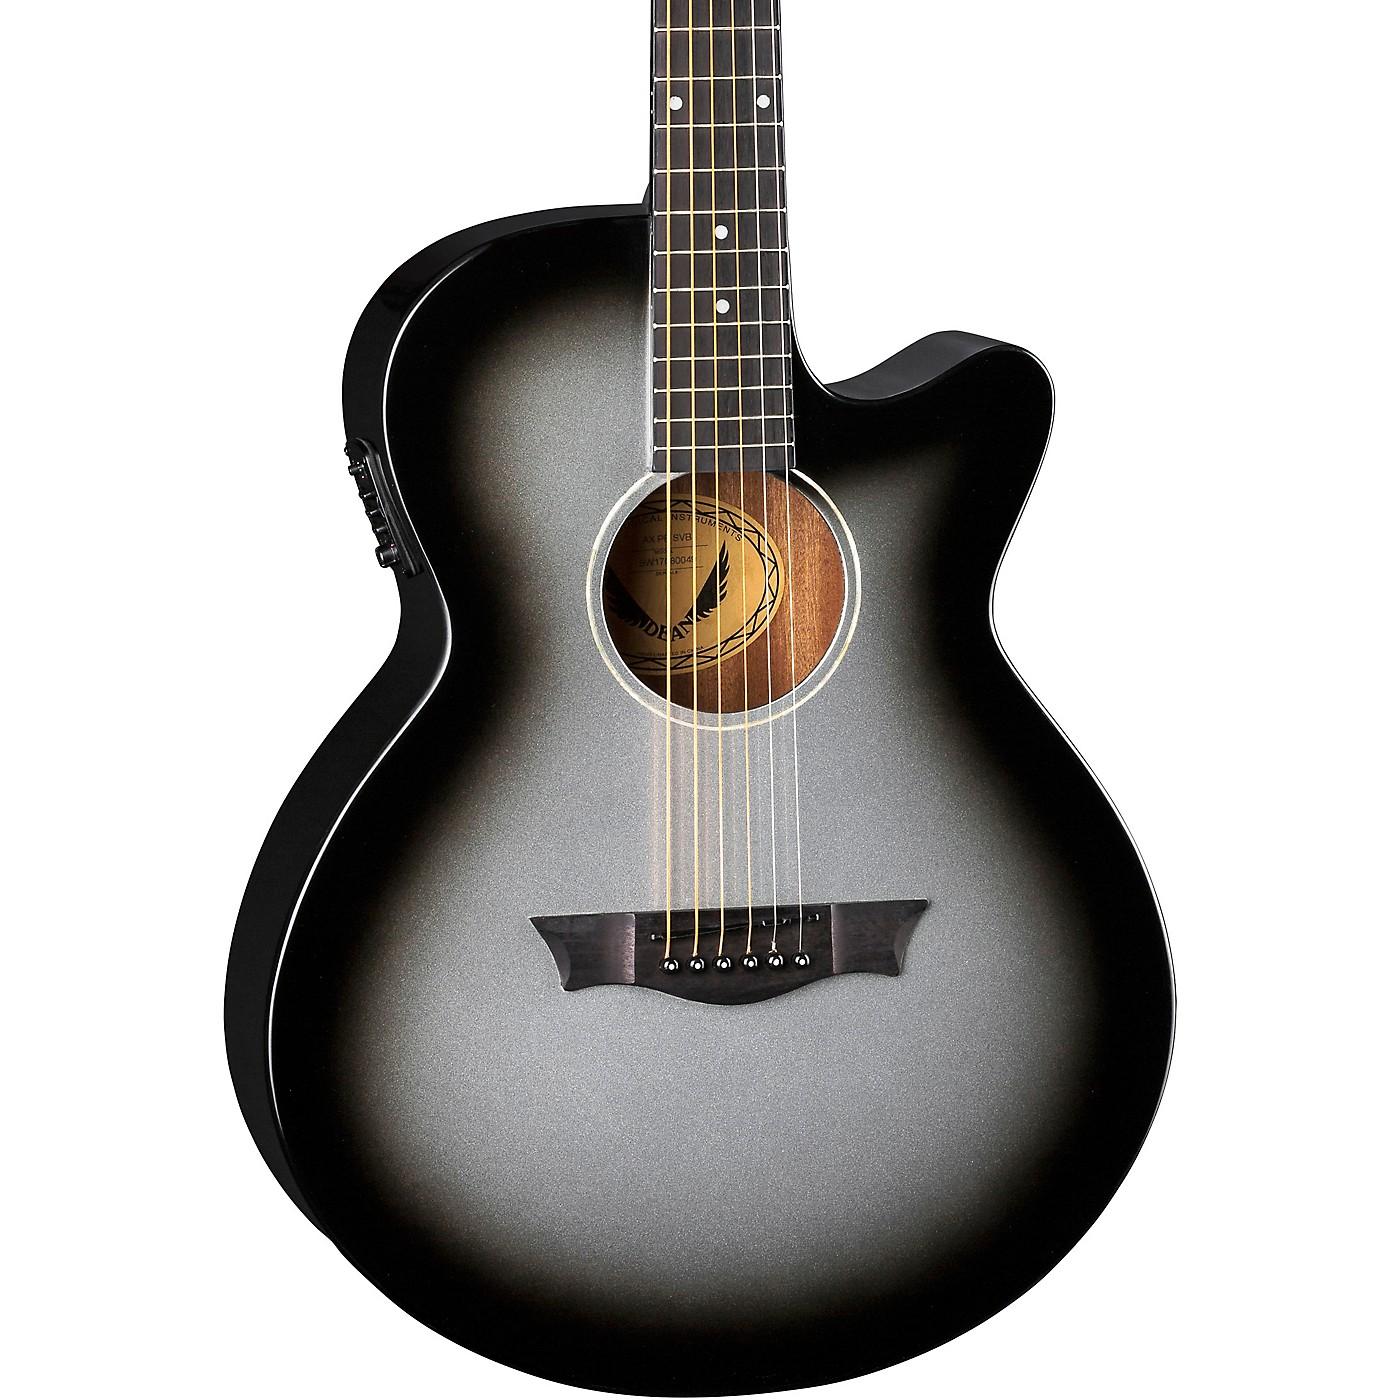 Dean Axcess Performer Cutaway Acoustic-Electric Guitar thumbnail